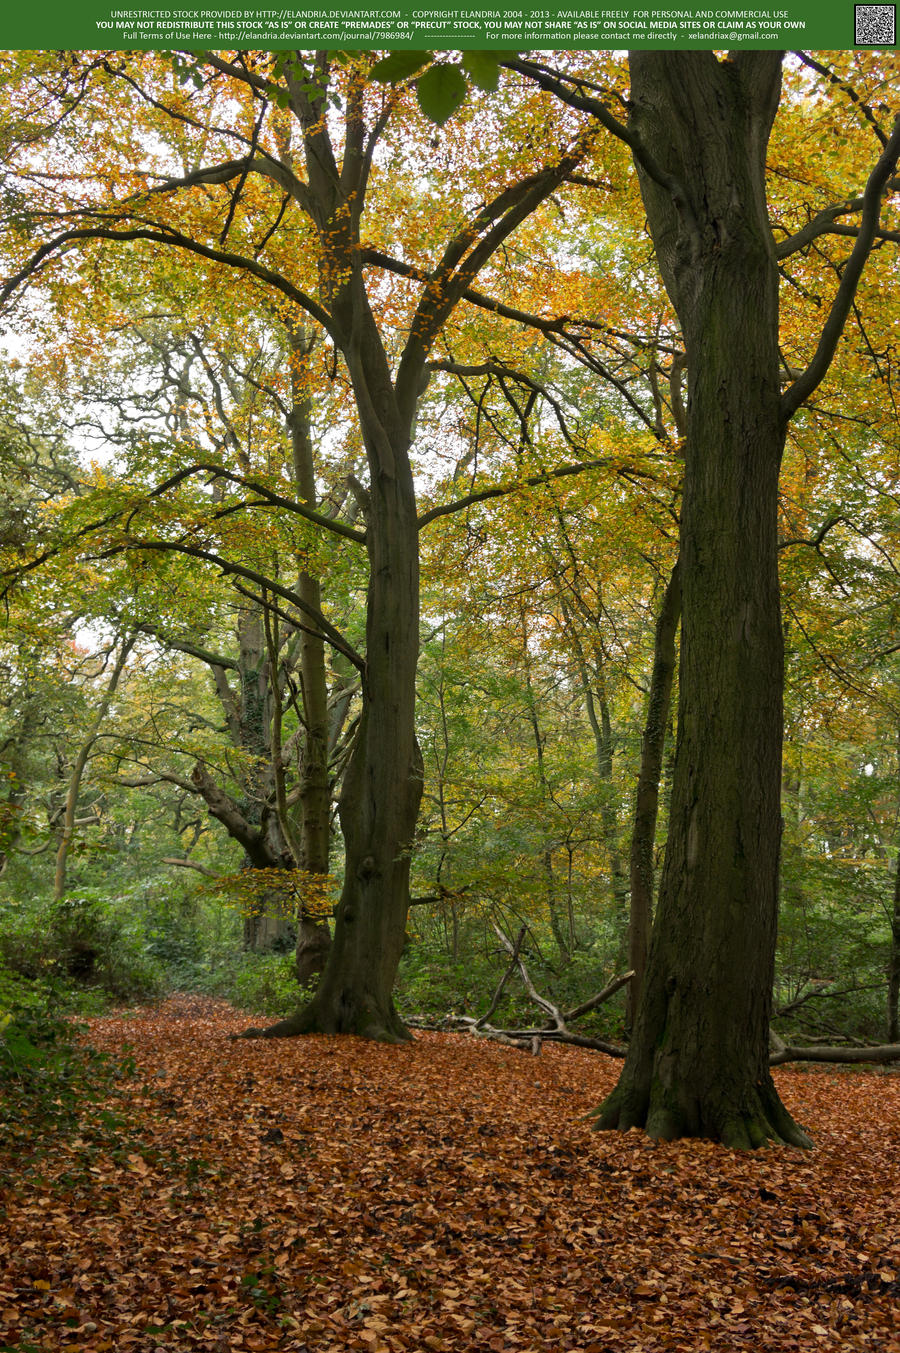 Woodlands  04 UNRESTRICTED by Elandria